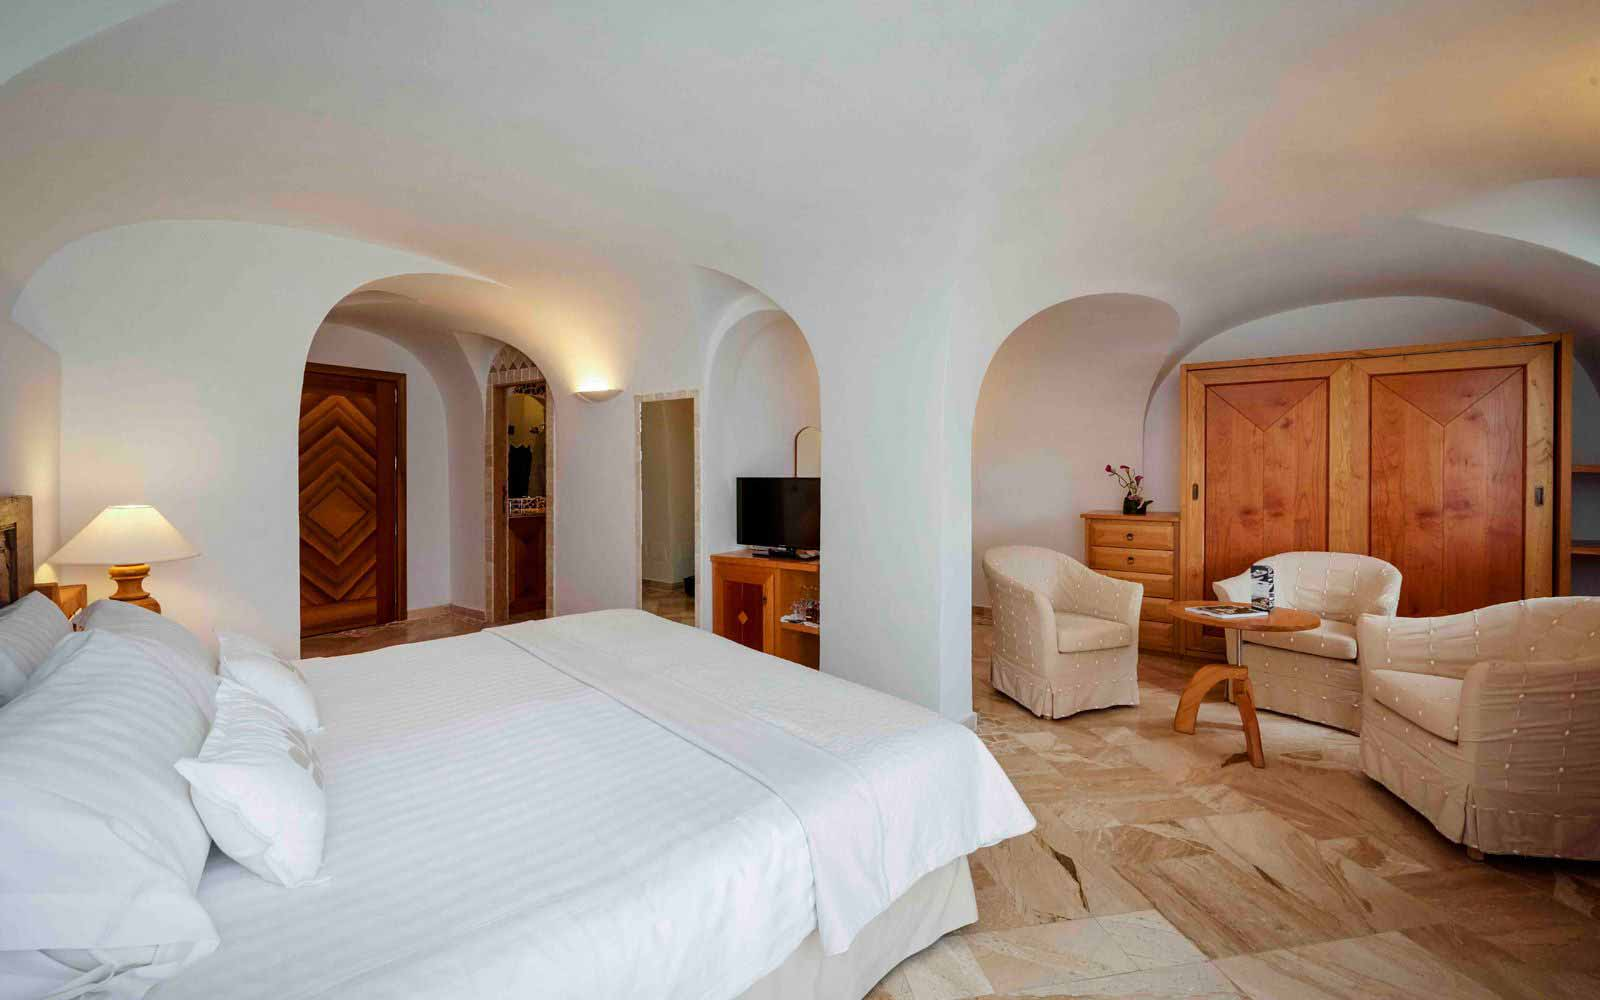 Deluxe room at Grand Hotel Poltu Quatu